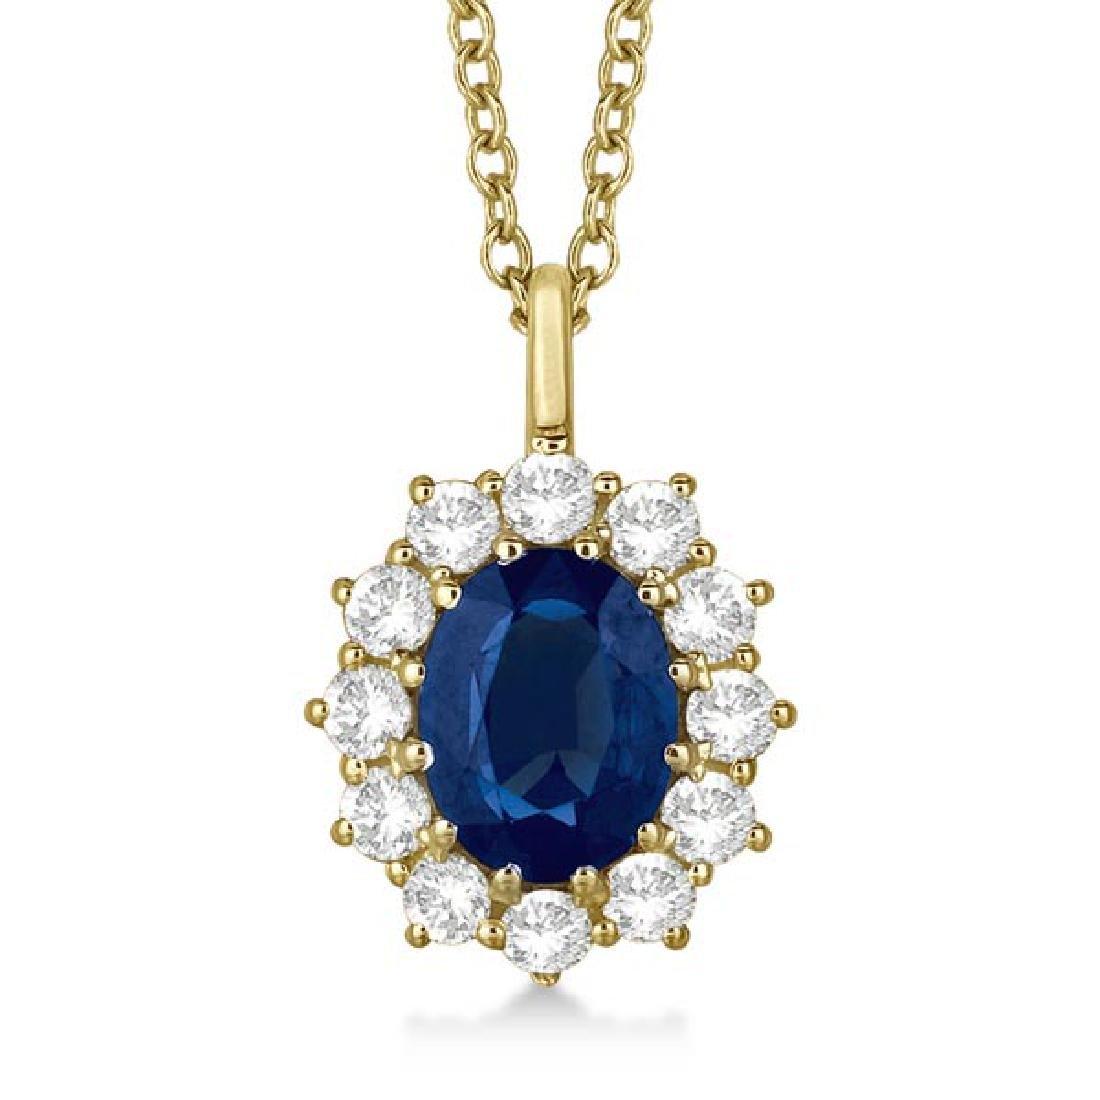 Oval Blue Sapphire and Diamond Pendant Necklace 14k Yel